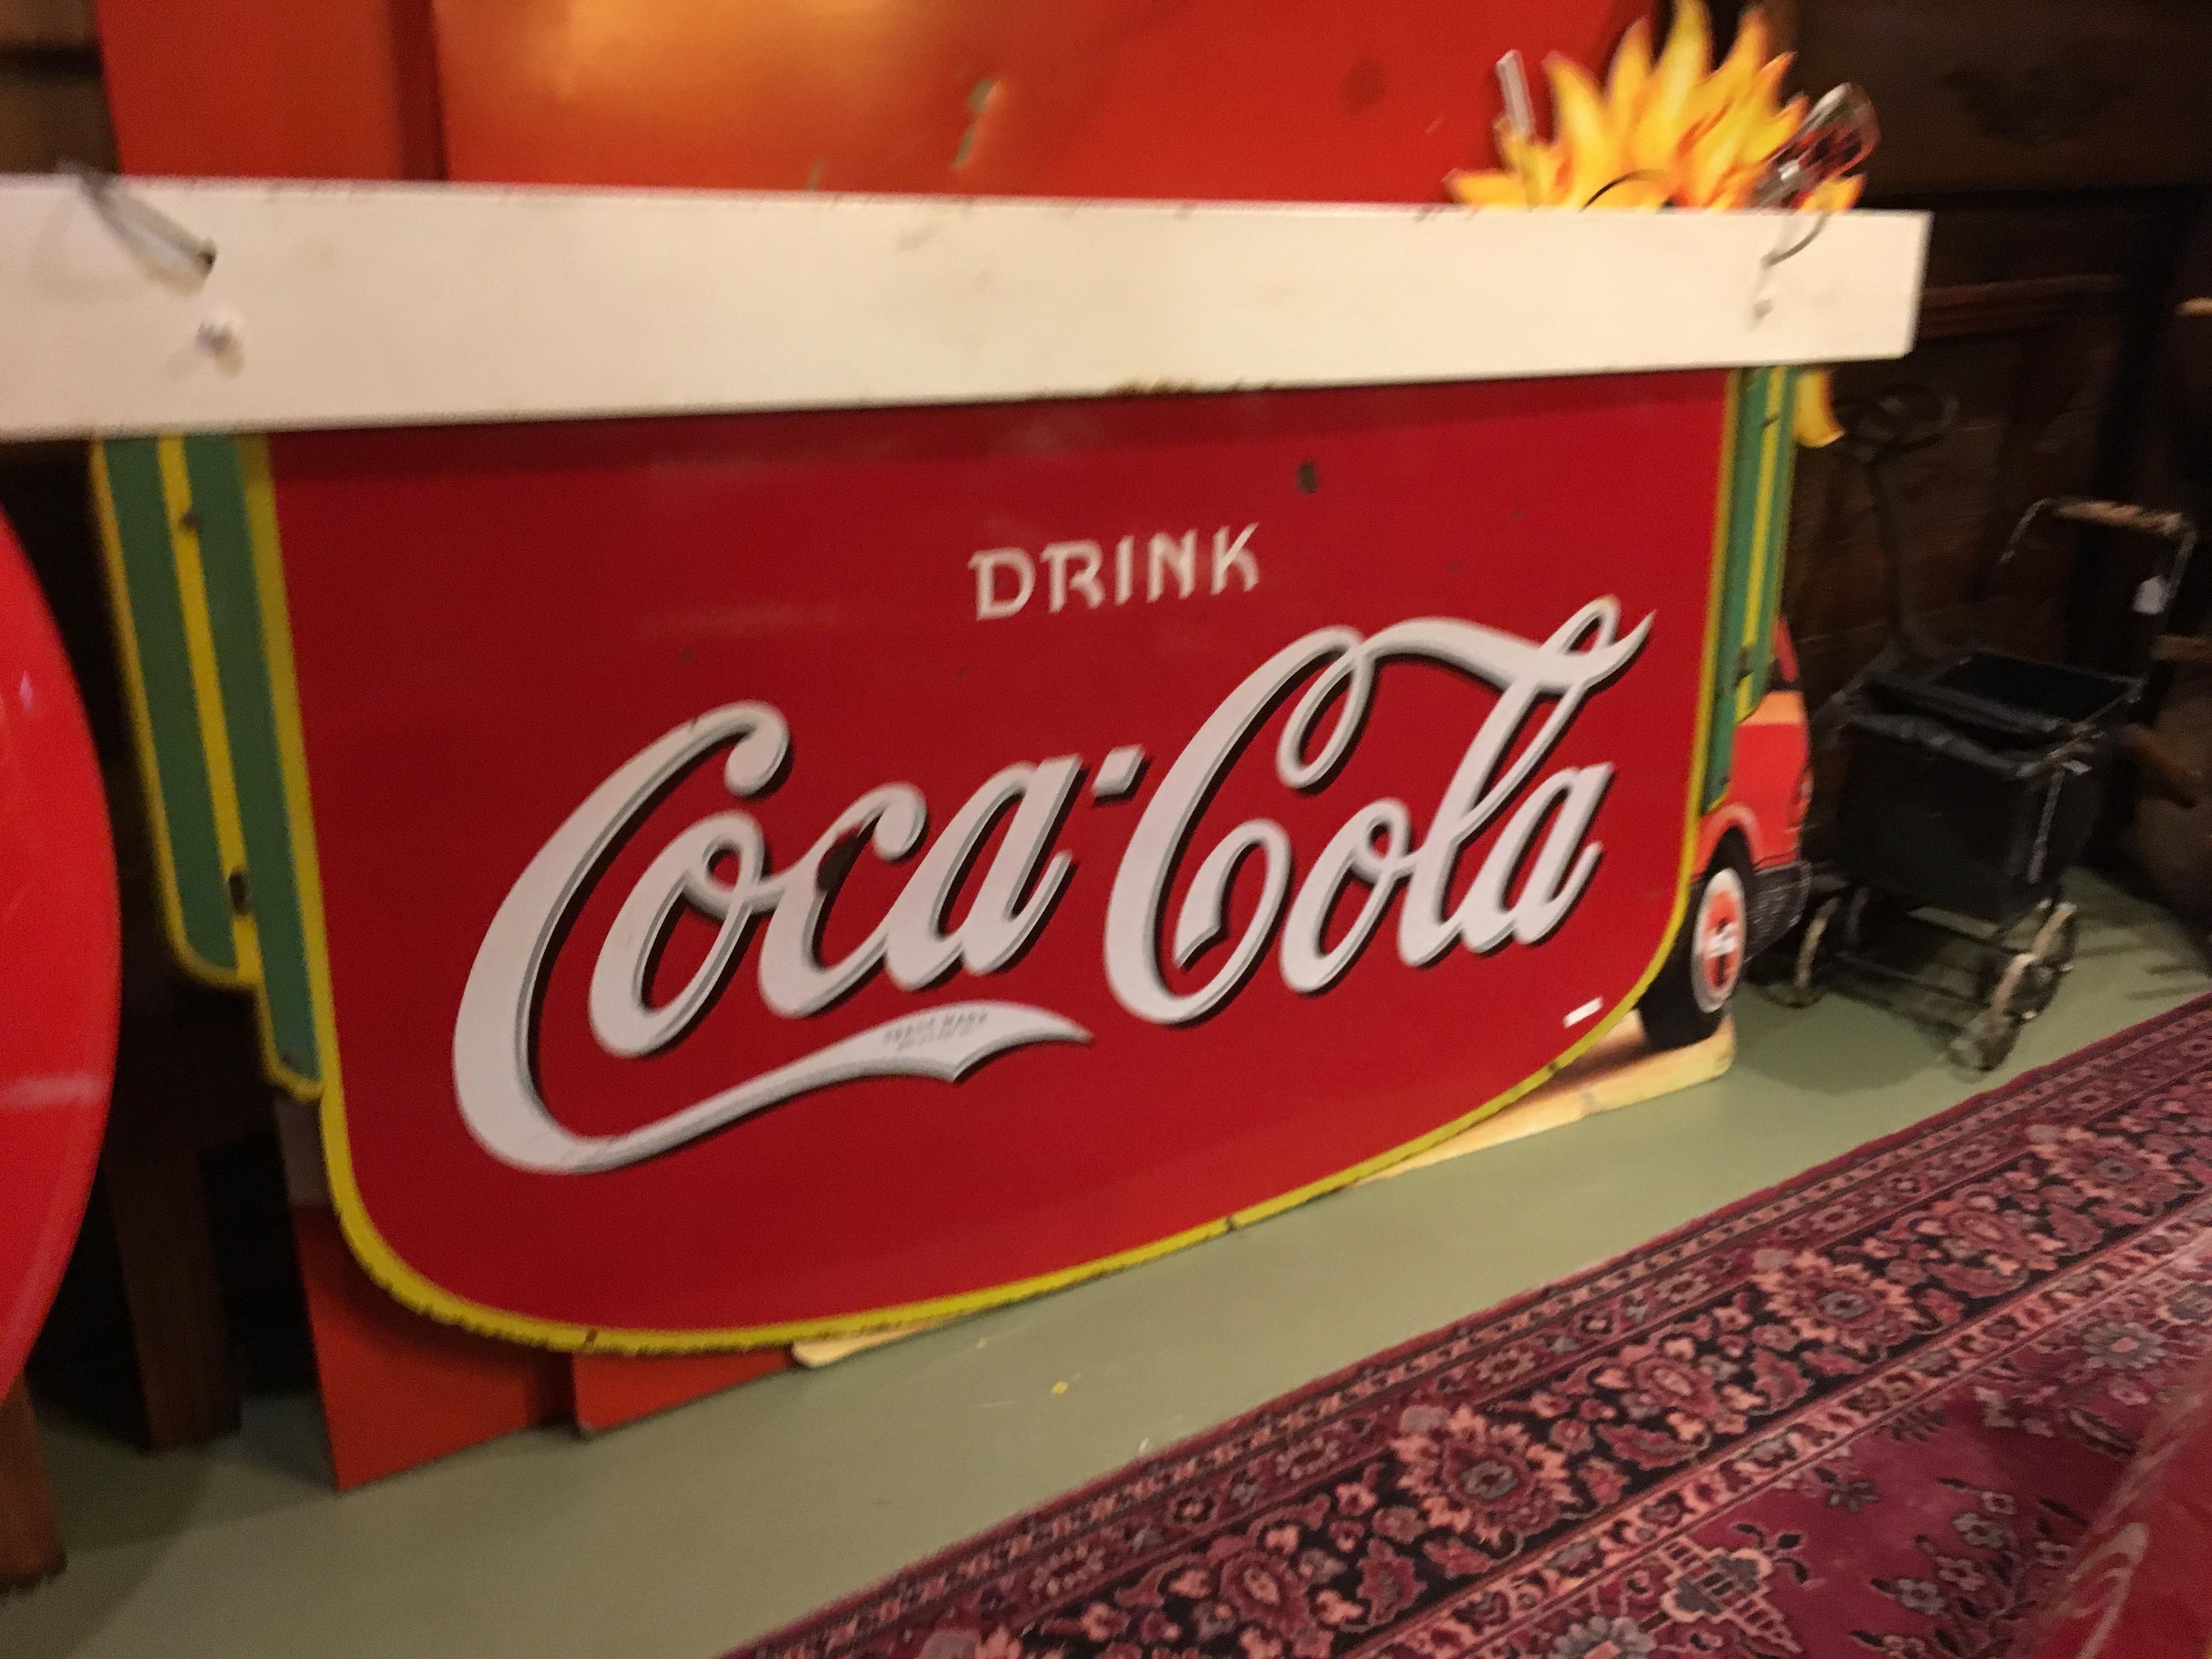 coca cola art deco fountain 2 sided sign 1935 68 x 37 archer 39 s antiques. Black Bedroom Furniture Sets. Home Design Ideas